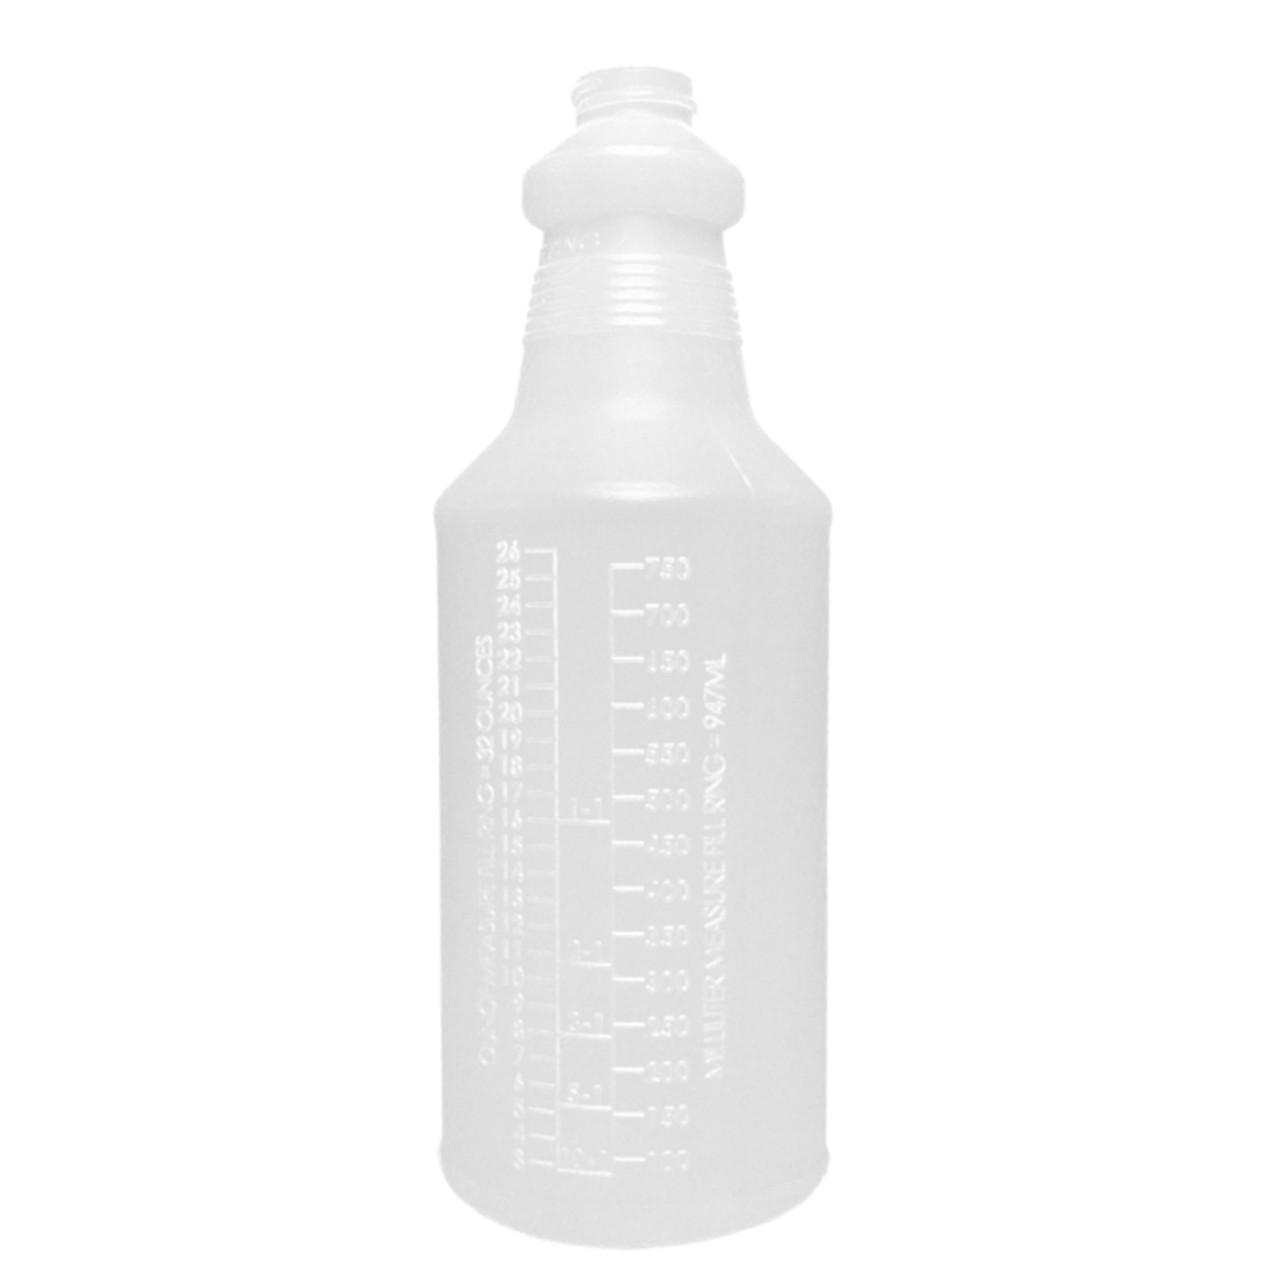 "32oz round spray bottle uses a sprayer with a 9-1/2"" dip tube."